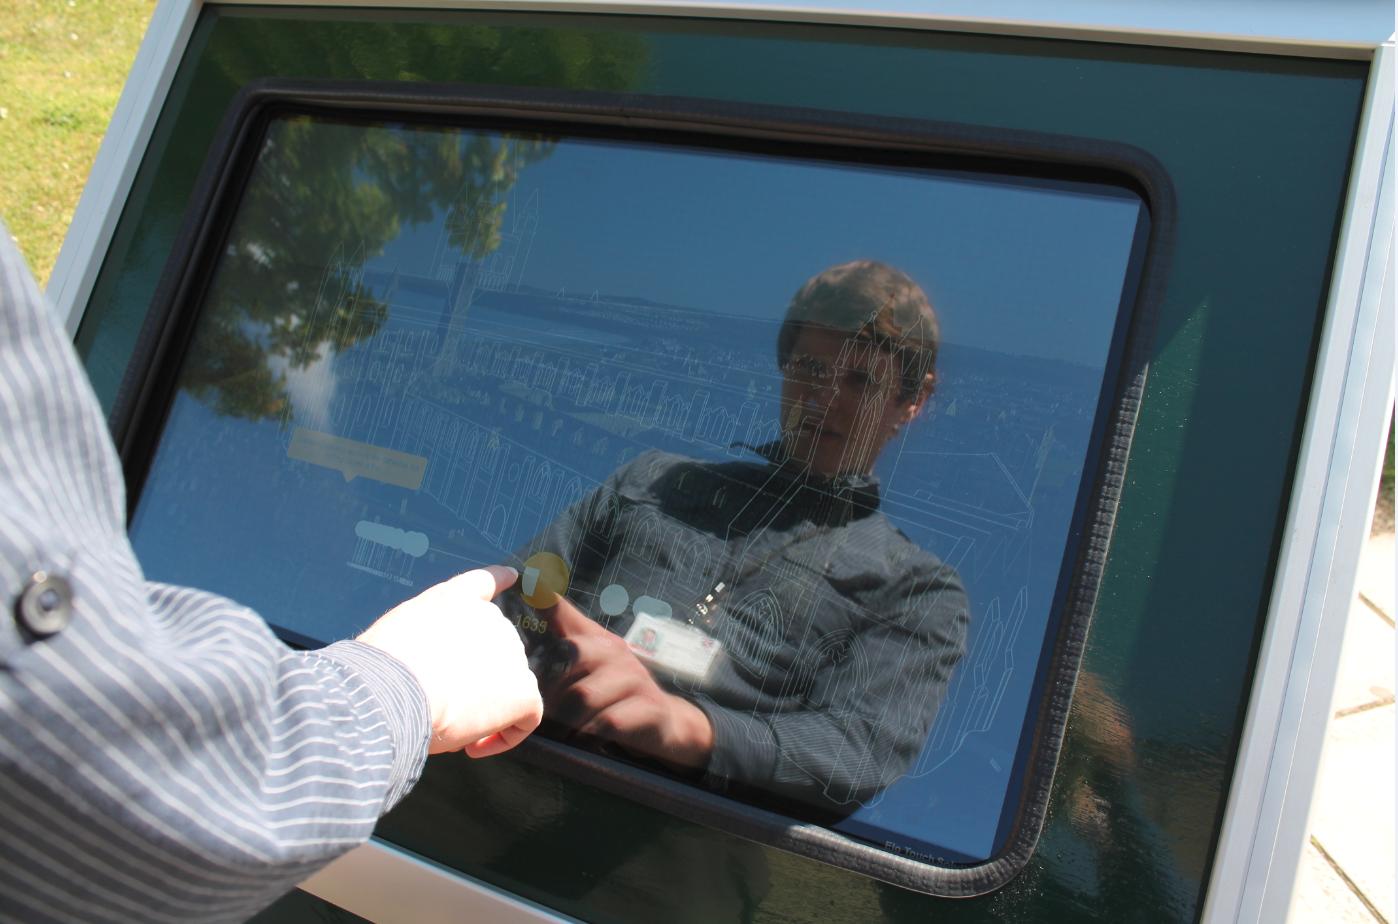 Dr. David Harris-Birtill using the LADDIE display